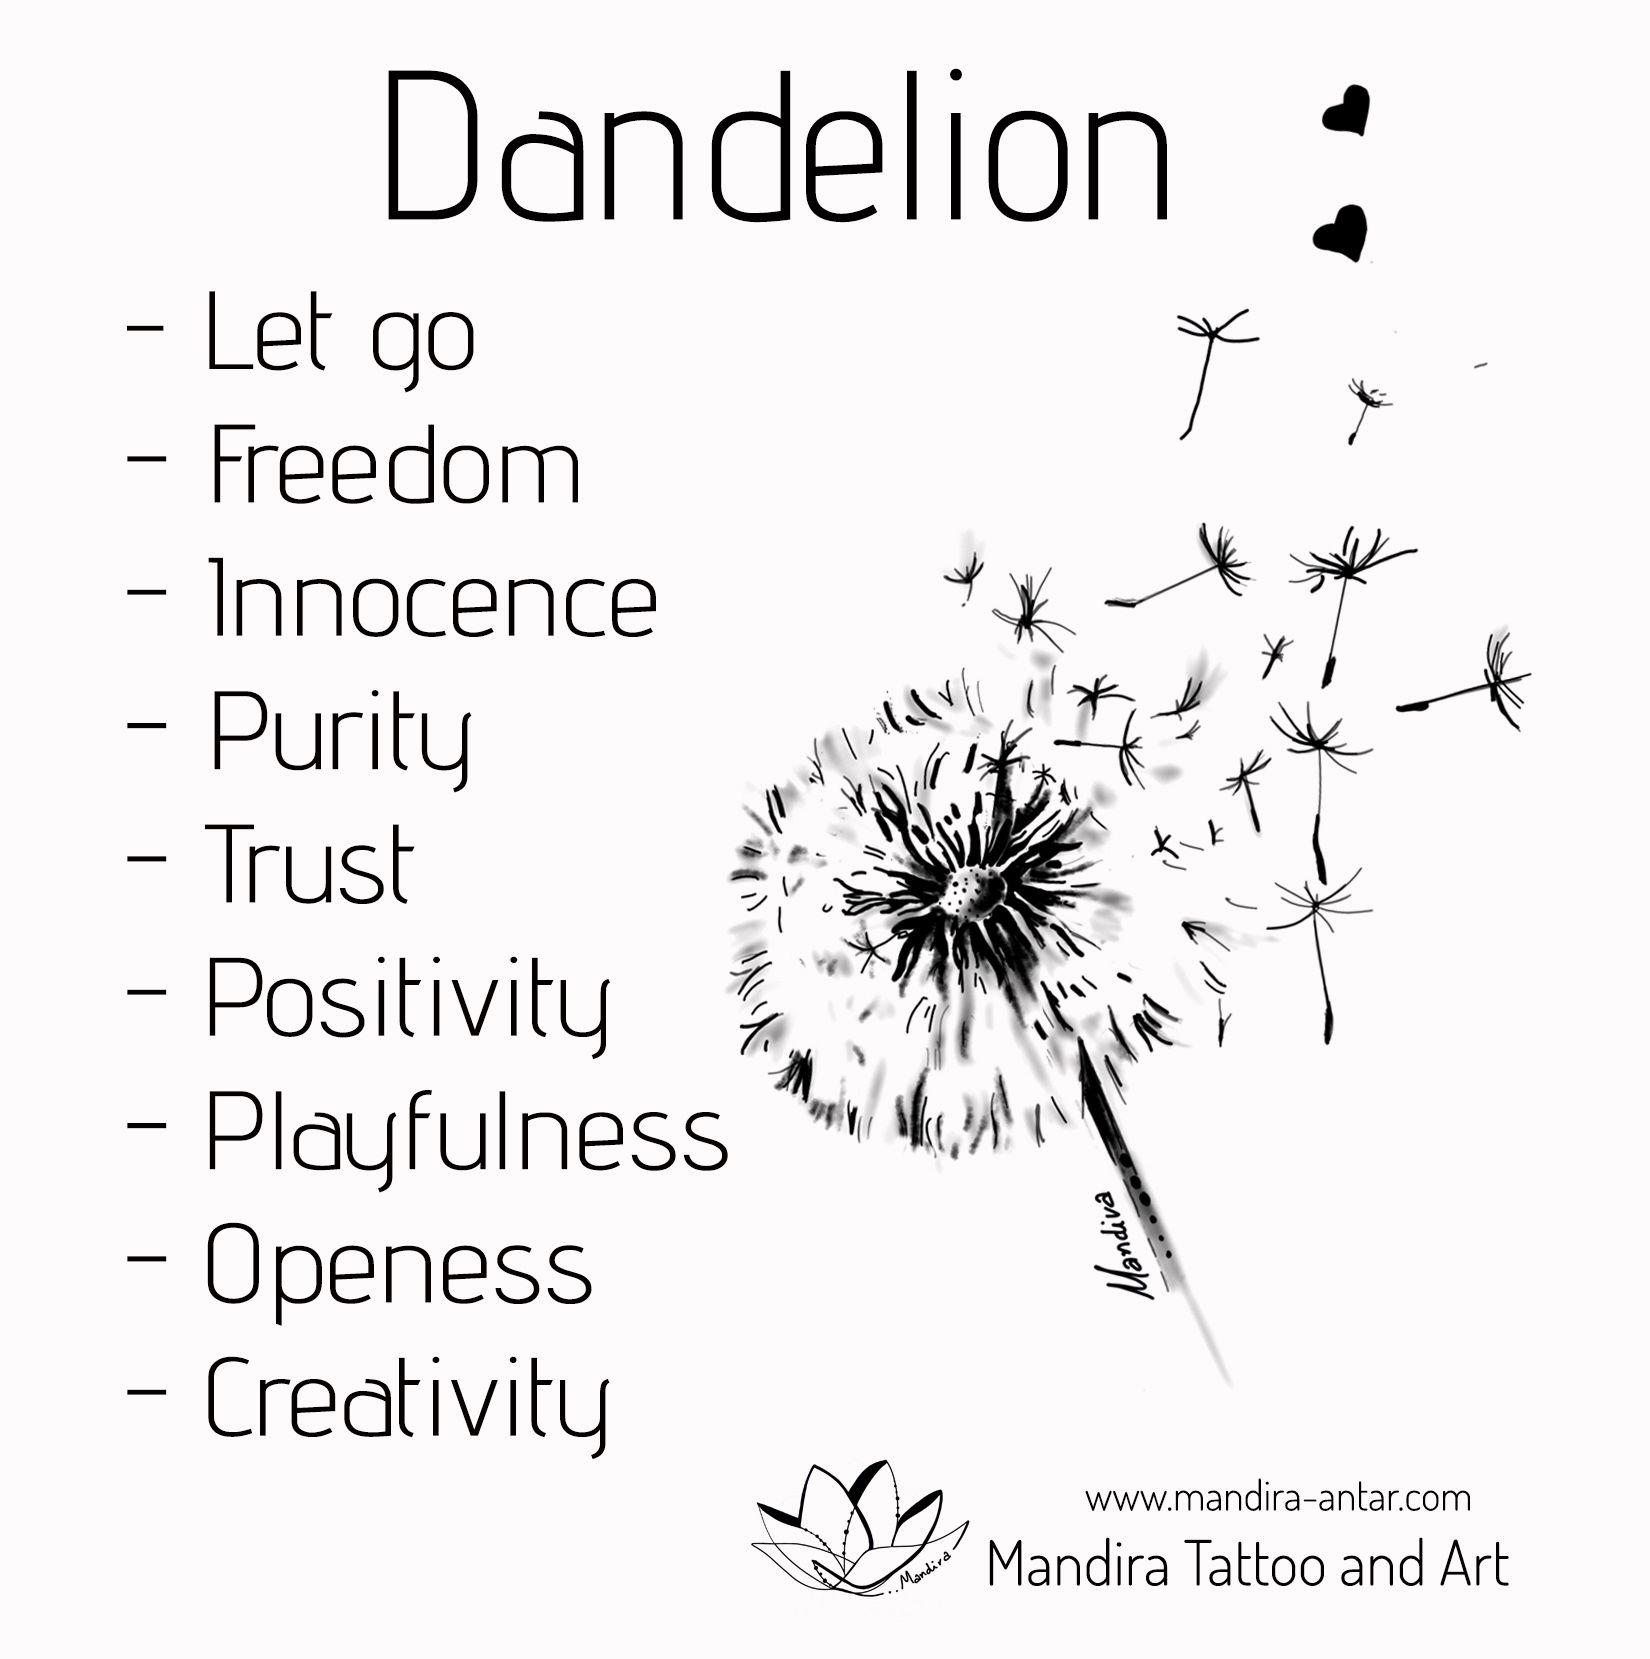 Dandelion Tattoo Symbol In 2020 Dandelion Tattoo Symbolic Tattoos Dandelion Tattoo Meaning